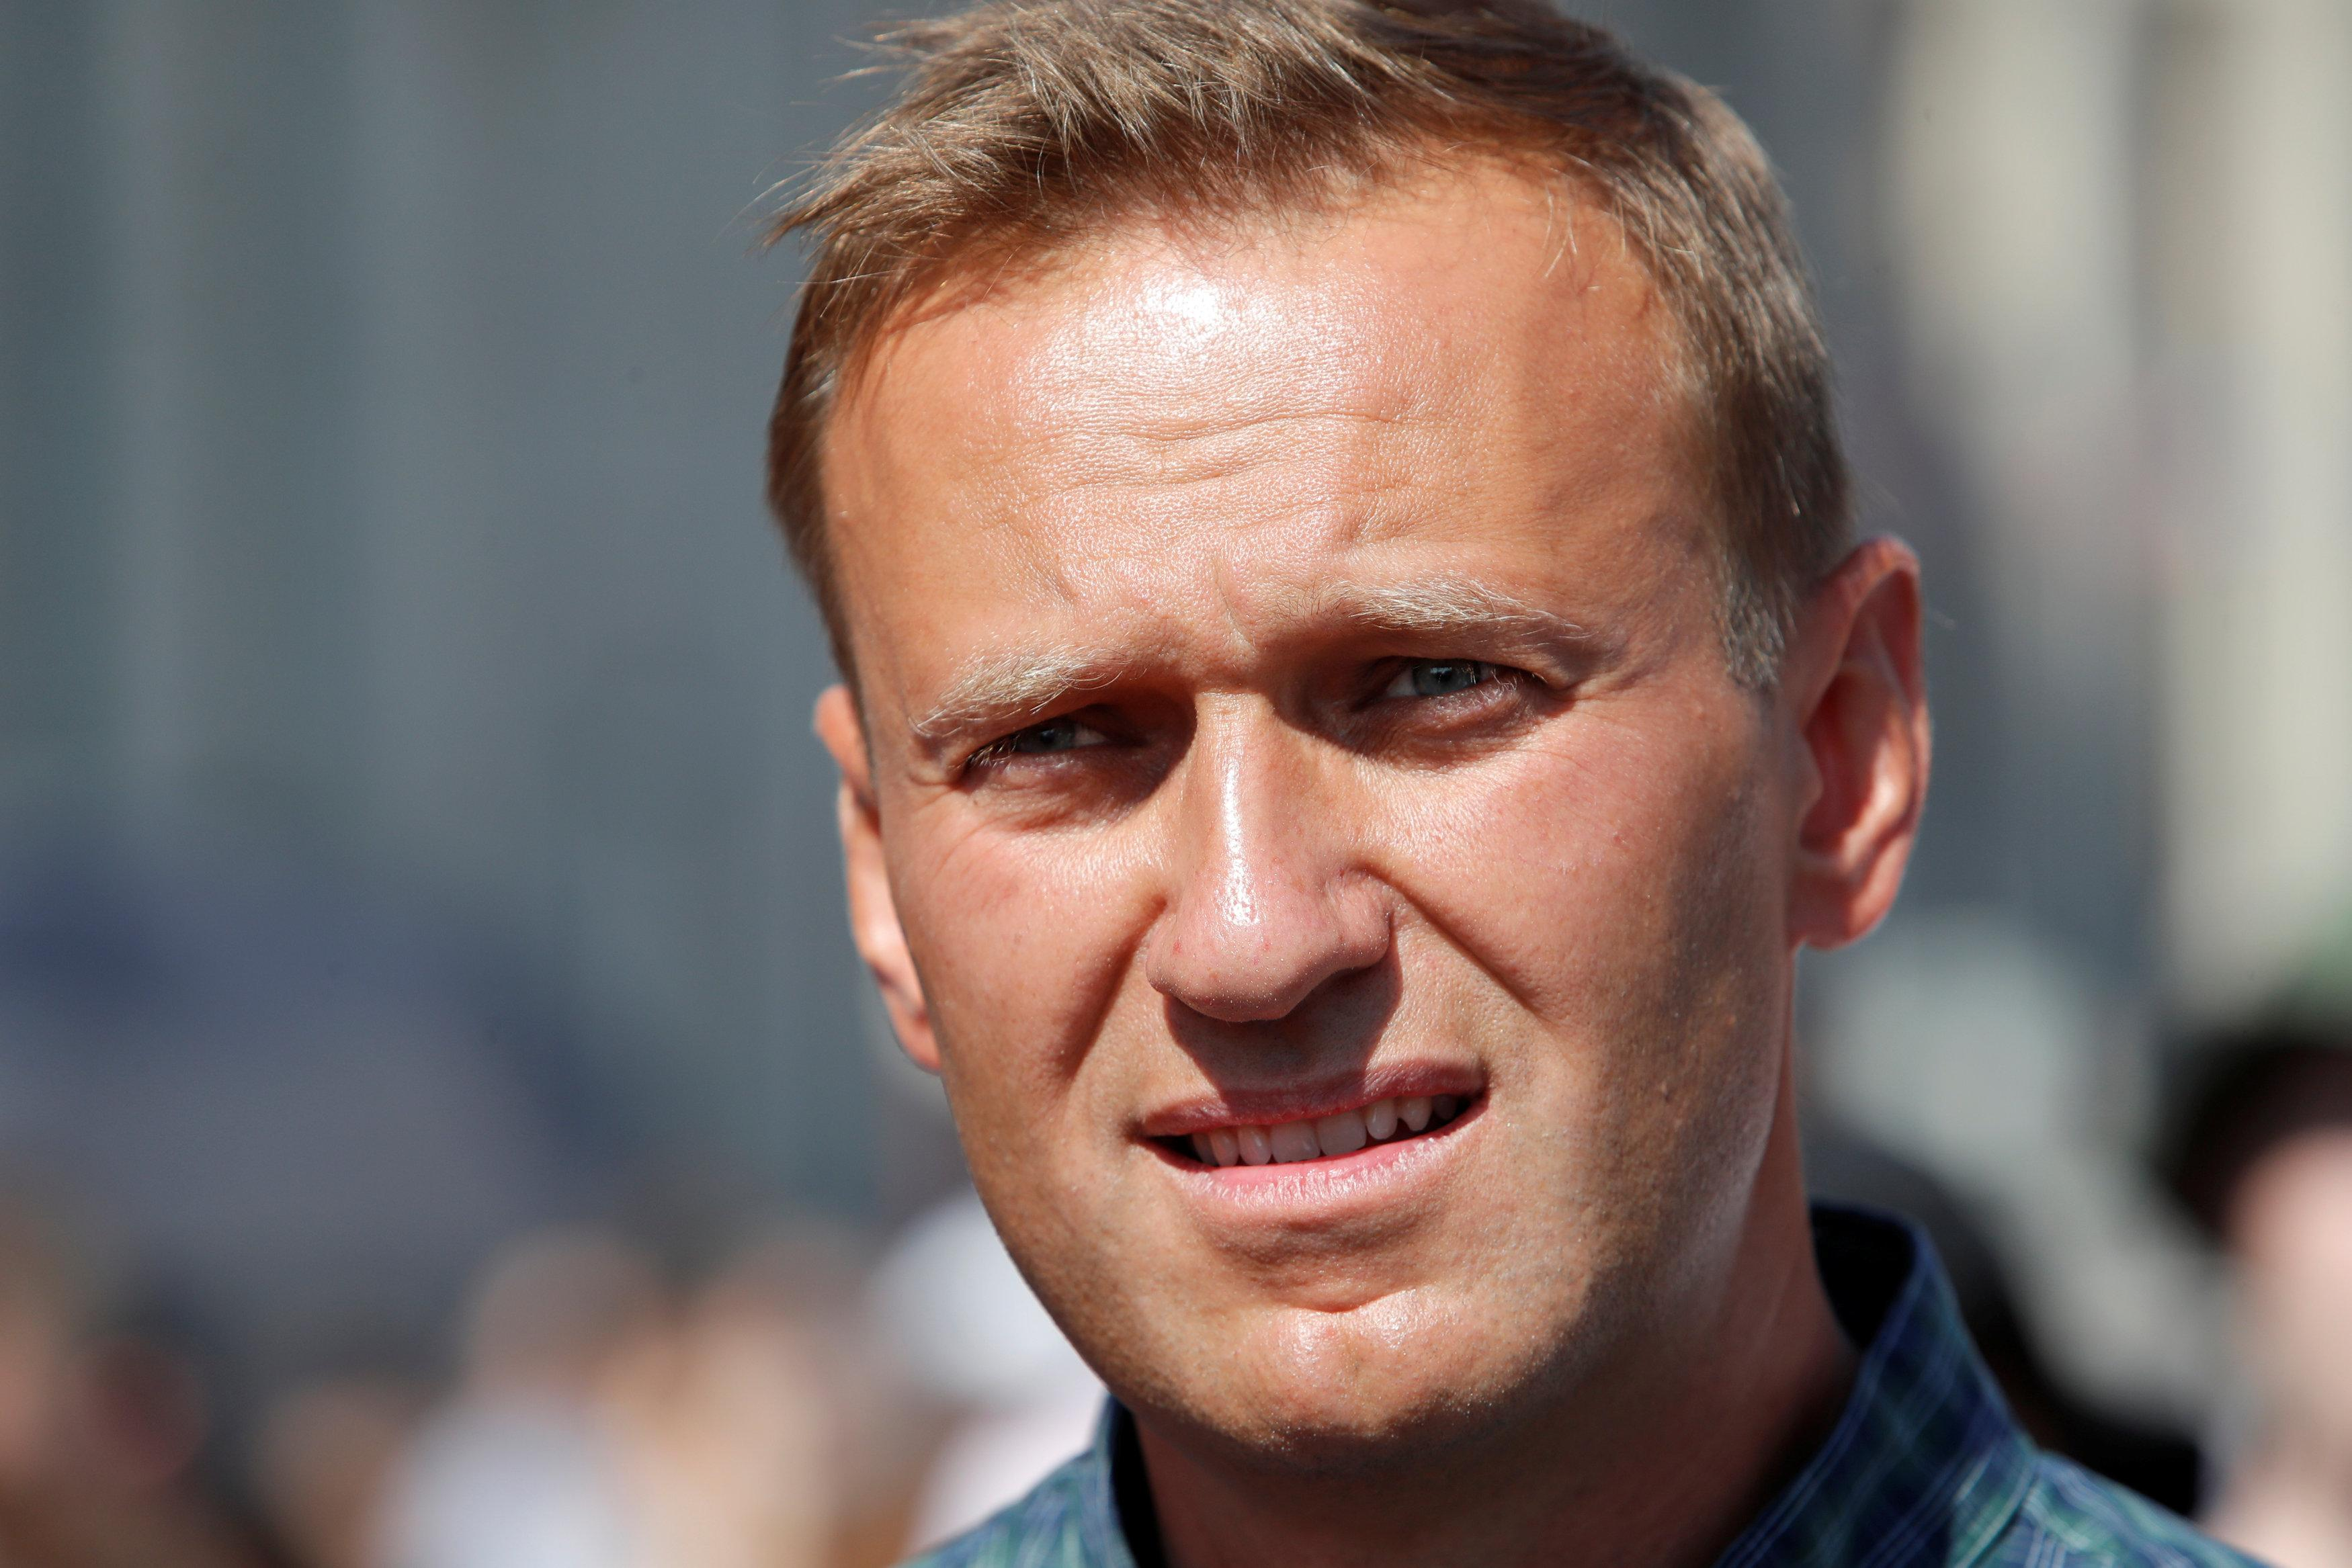 Russian court jails Kremlin critic Navalny for 30 days ...